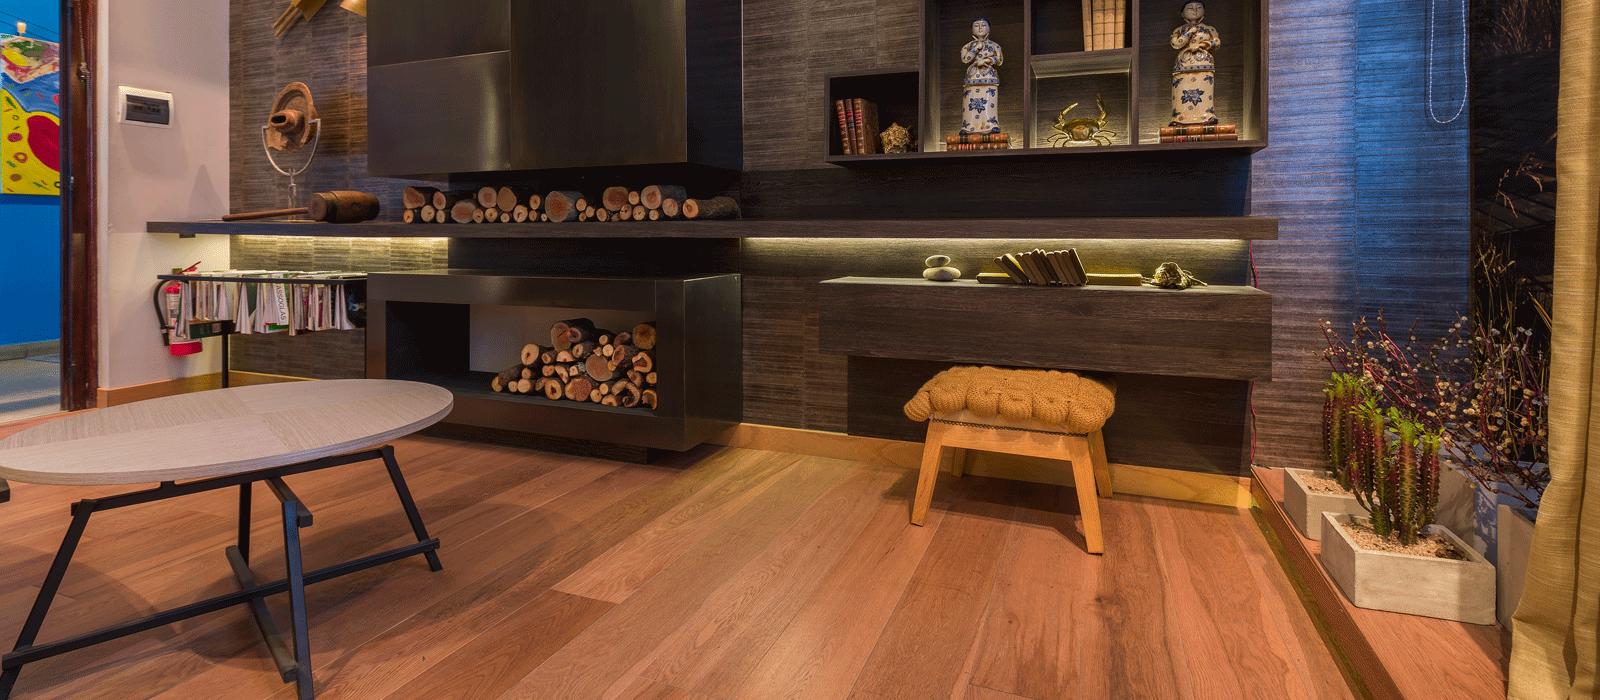 Design rooms patagonia flooring for Casa royal sucursales